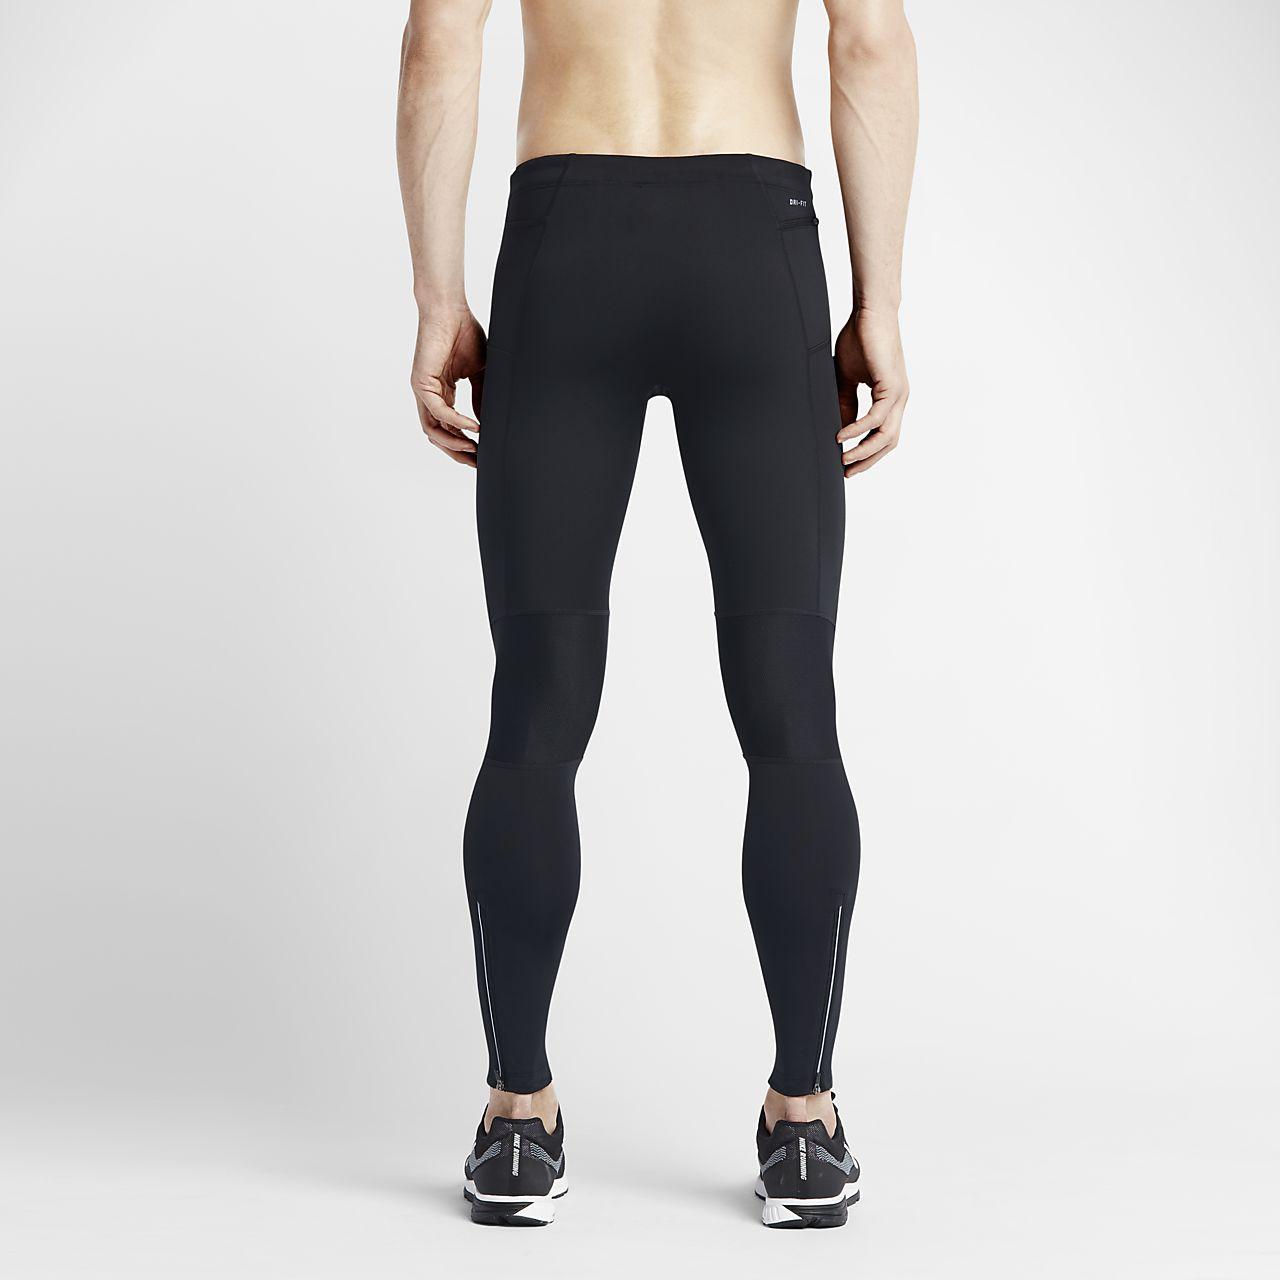 acd3a9cf1f Tights da running Nike Power Tech - Uomo. Nike.com IT